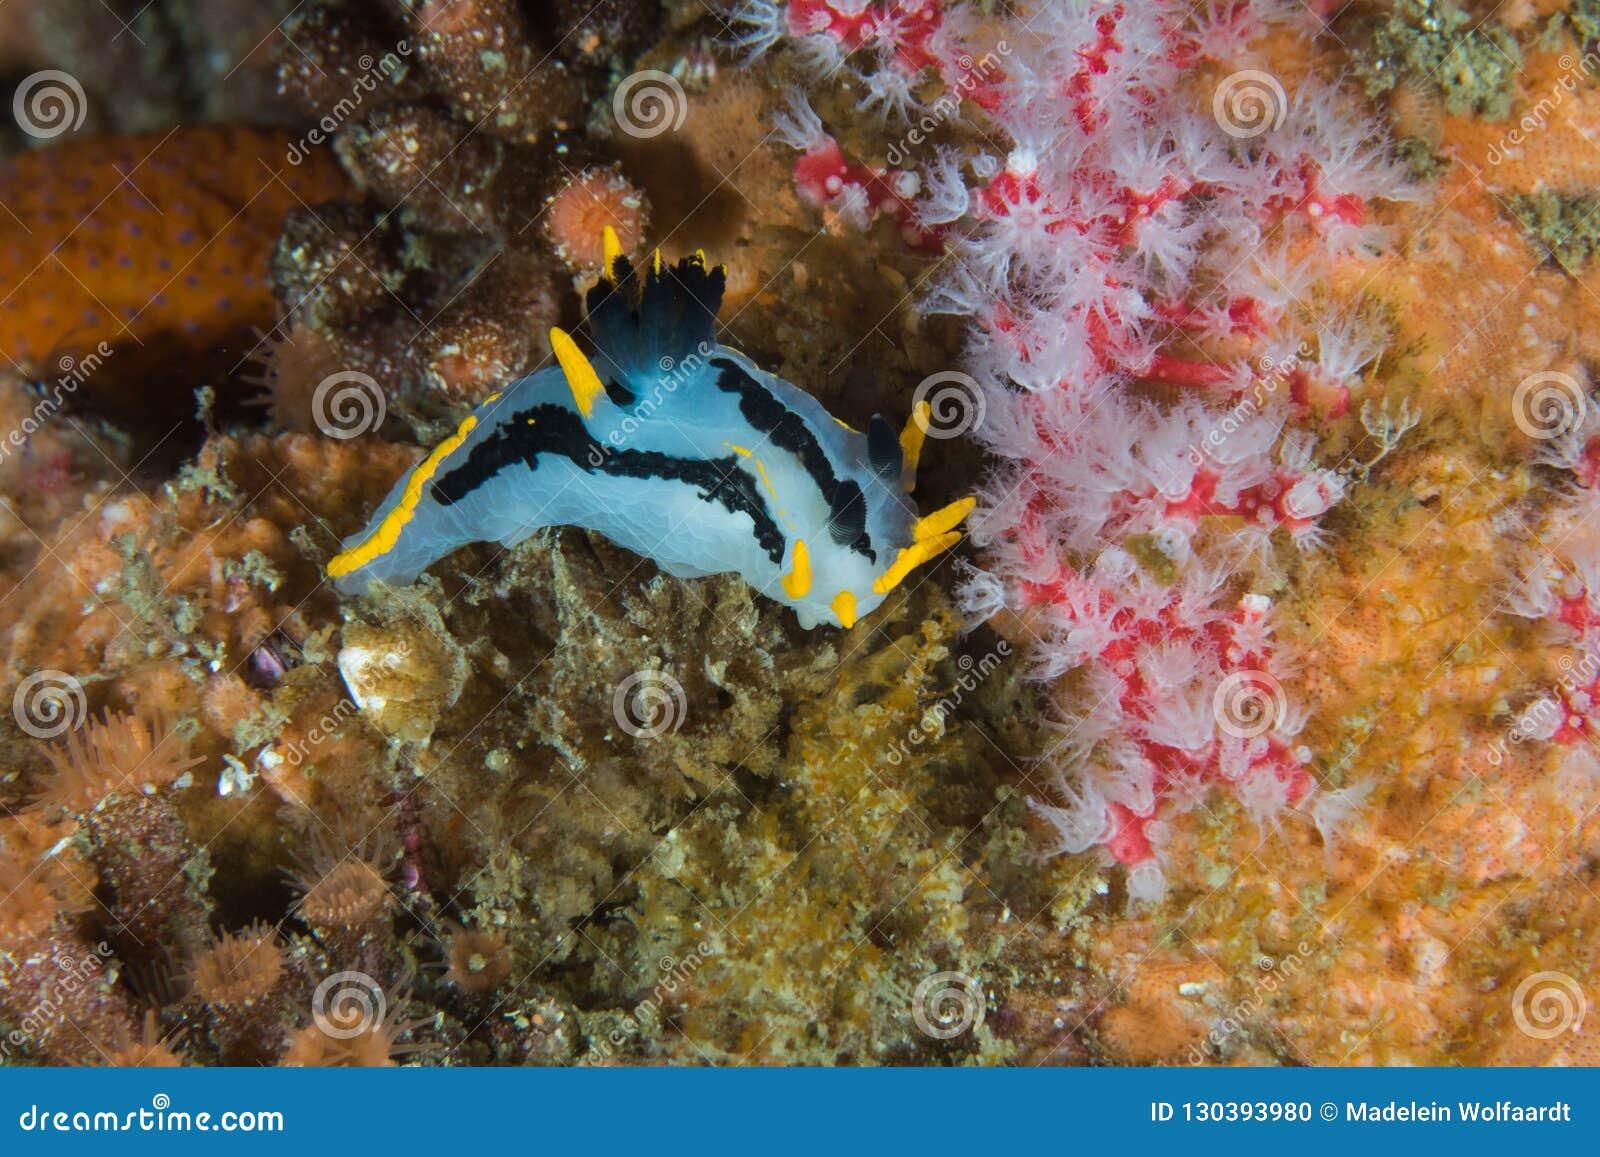 Mały Koronowany nudibranch Polycera capensis na rafie